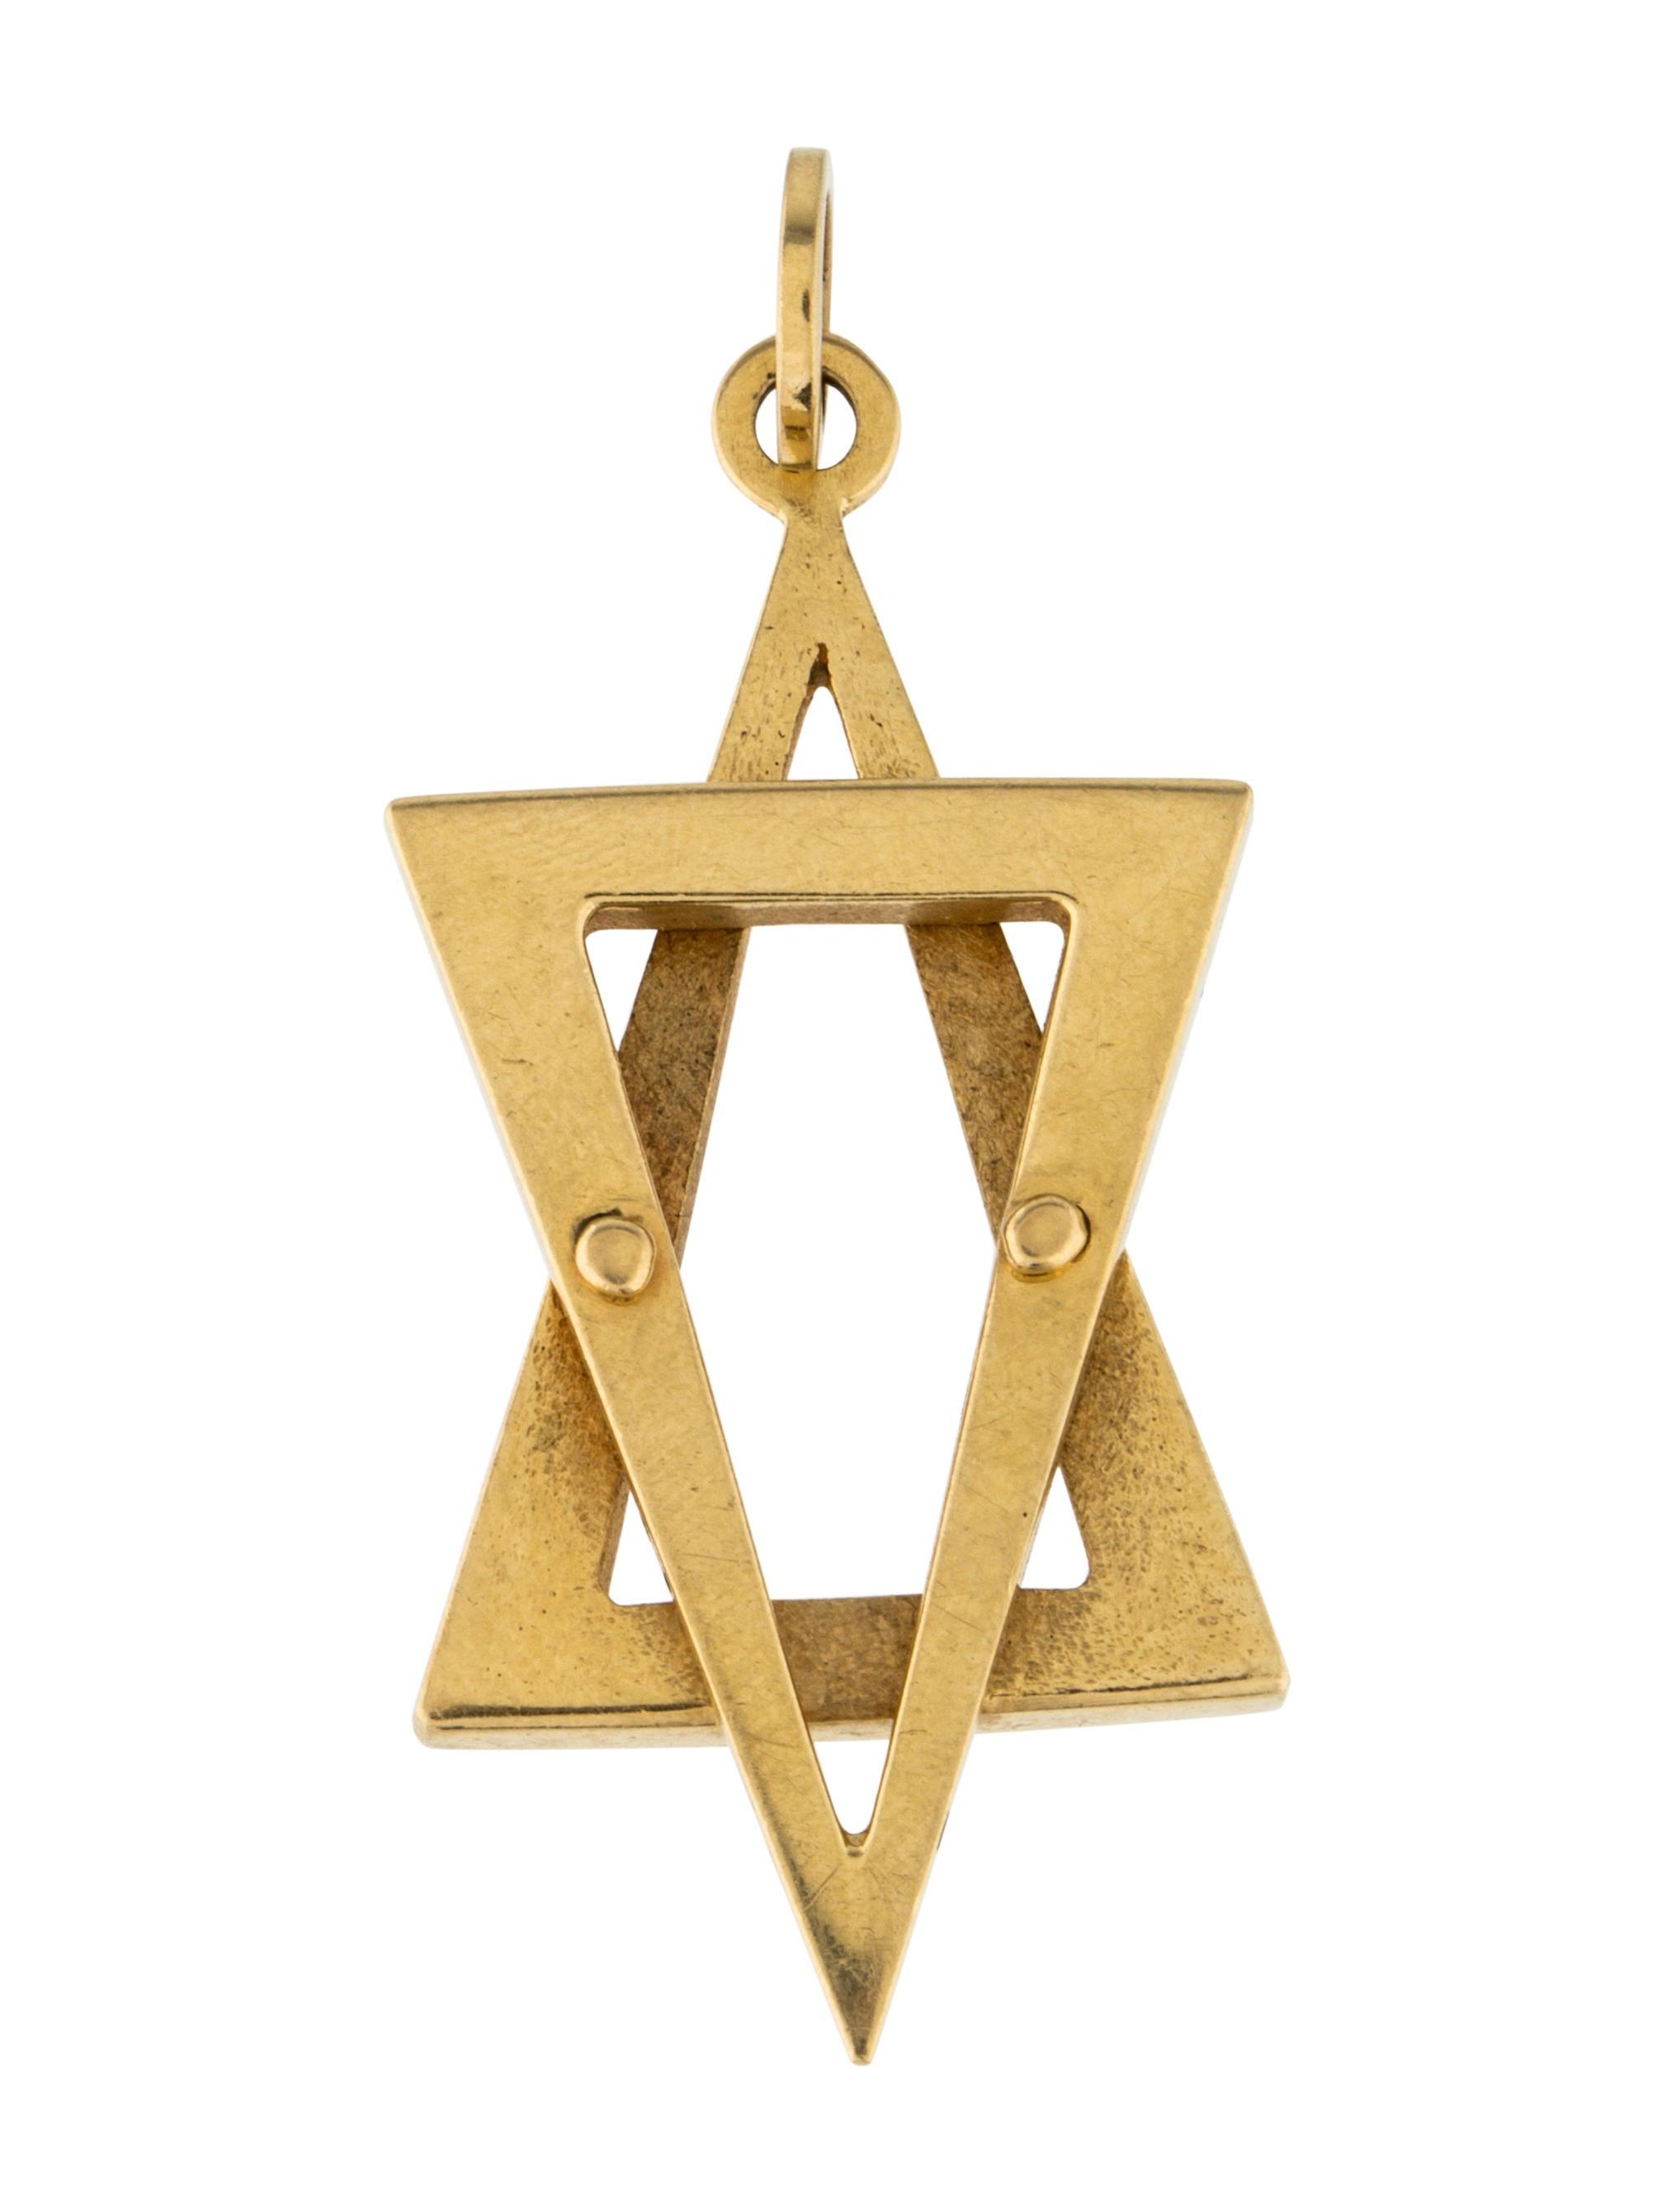 18k star of david pendant necklaces penda24208 the for Star hallmark on jewelry